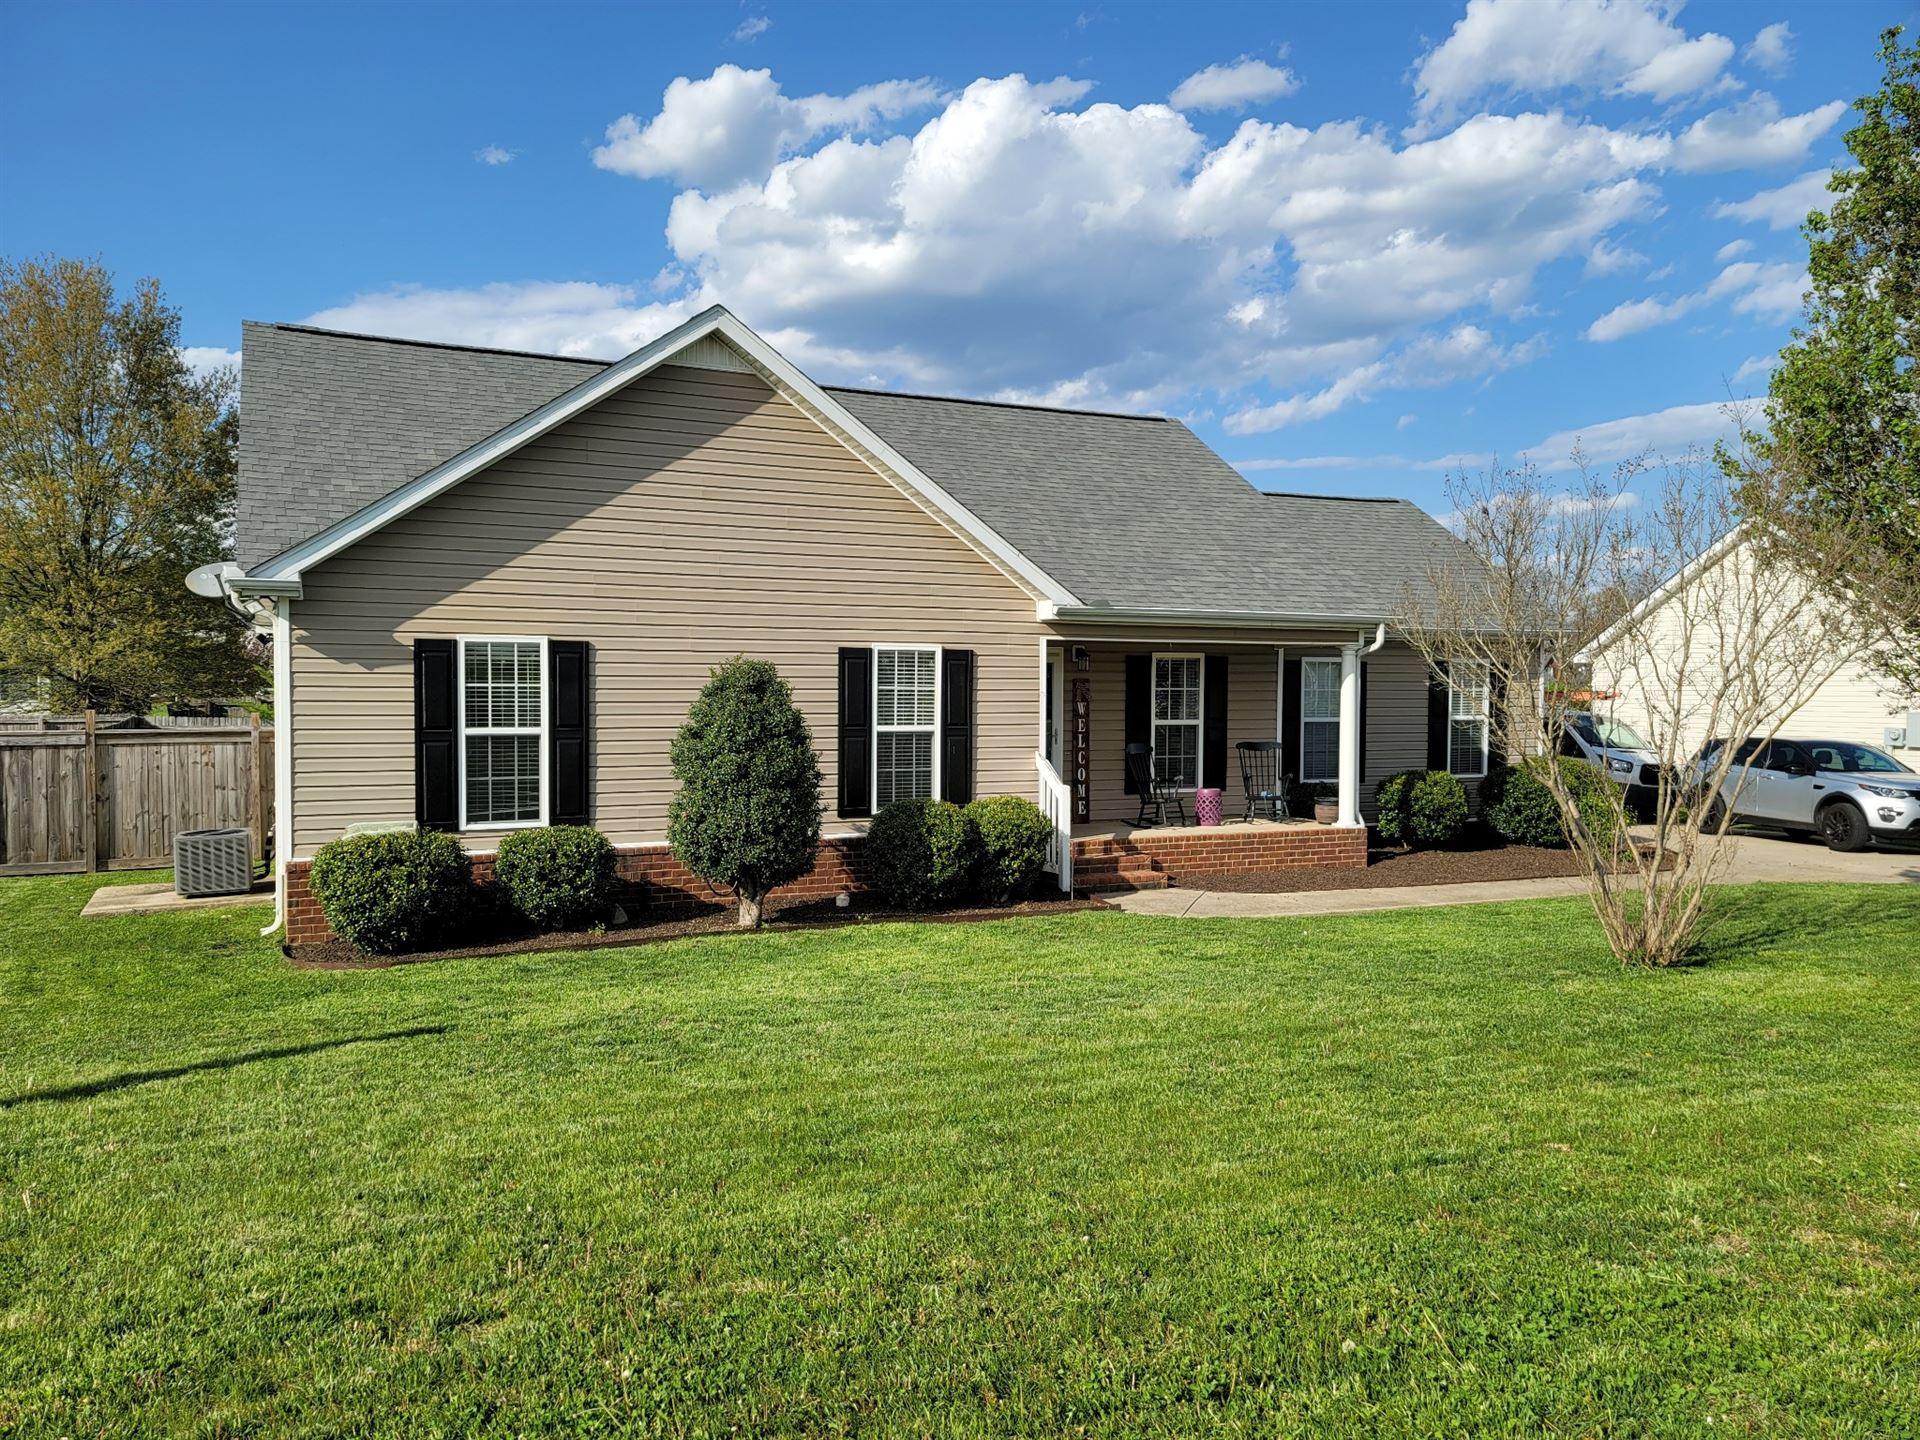 Photo of 5018 Betsy Ann Ave, Murfreesboro, TN 37129 (MLS # 2243439)